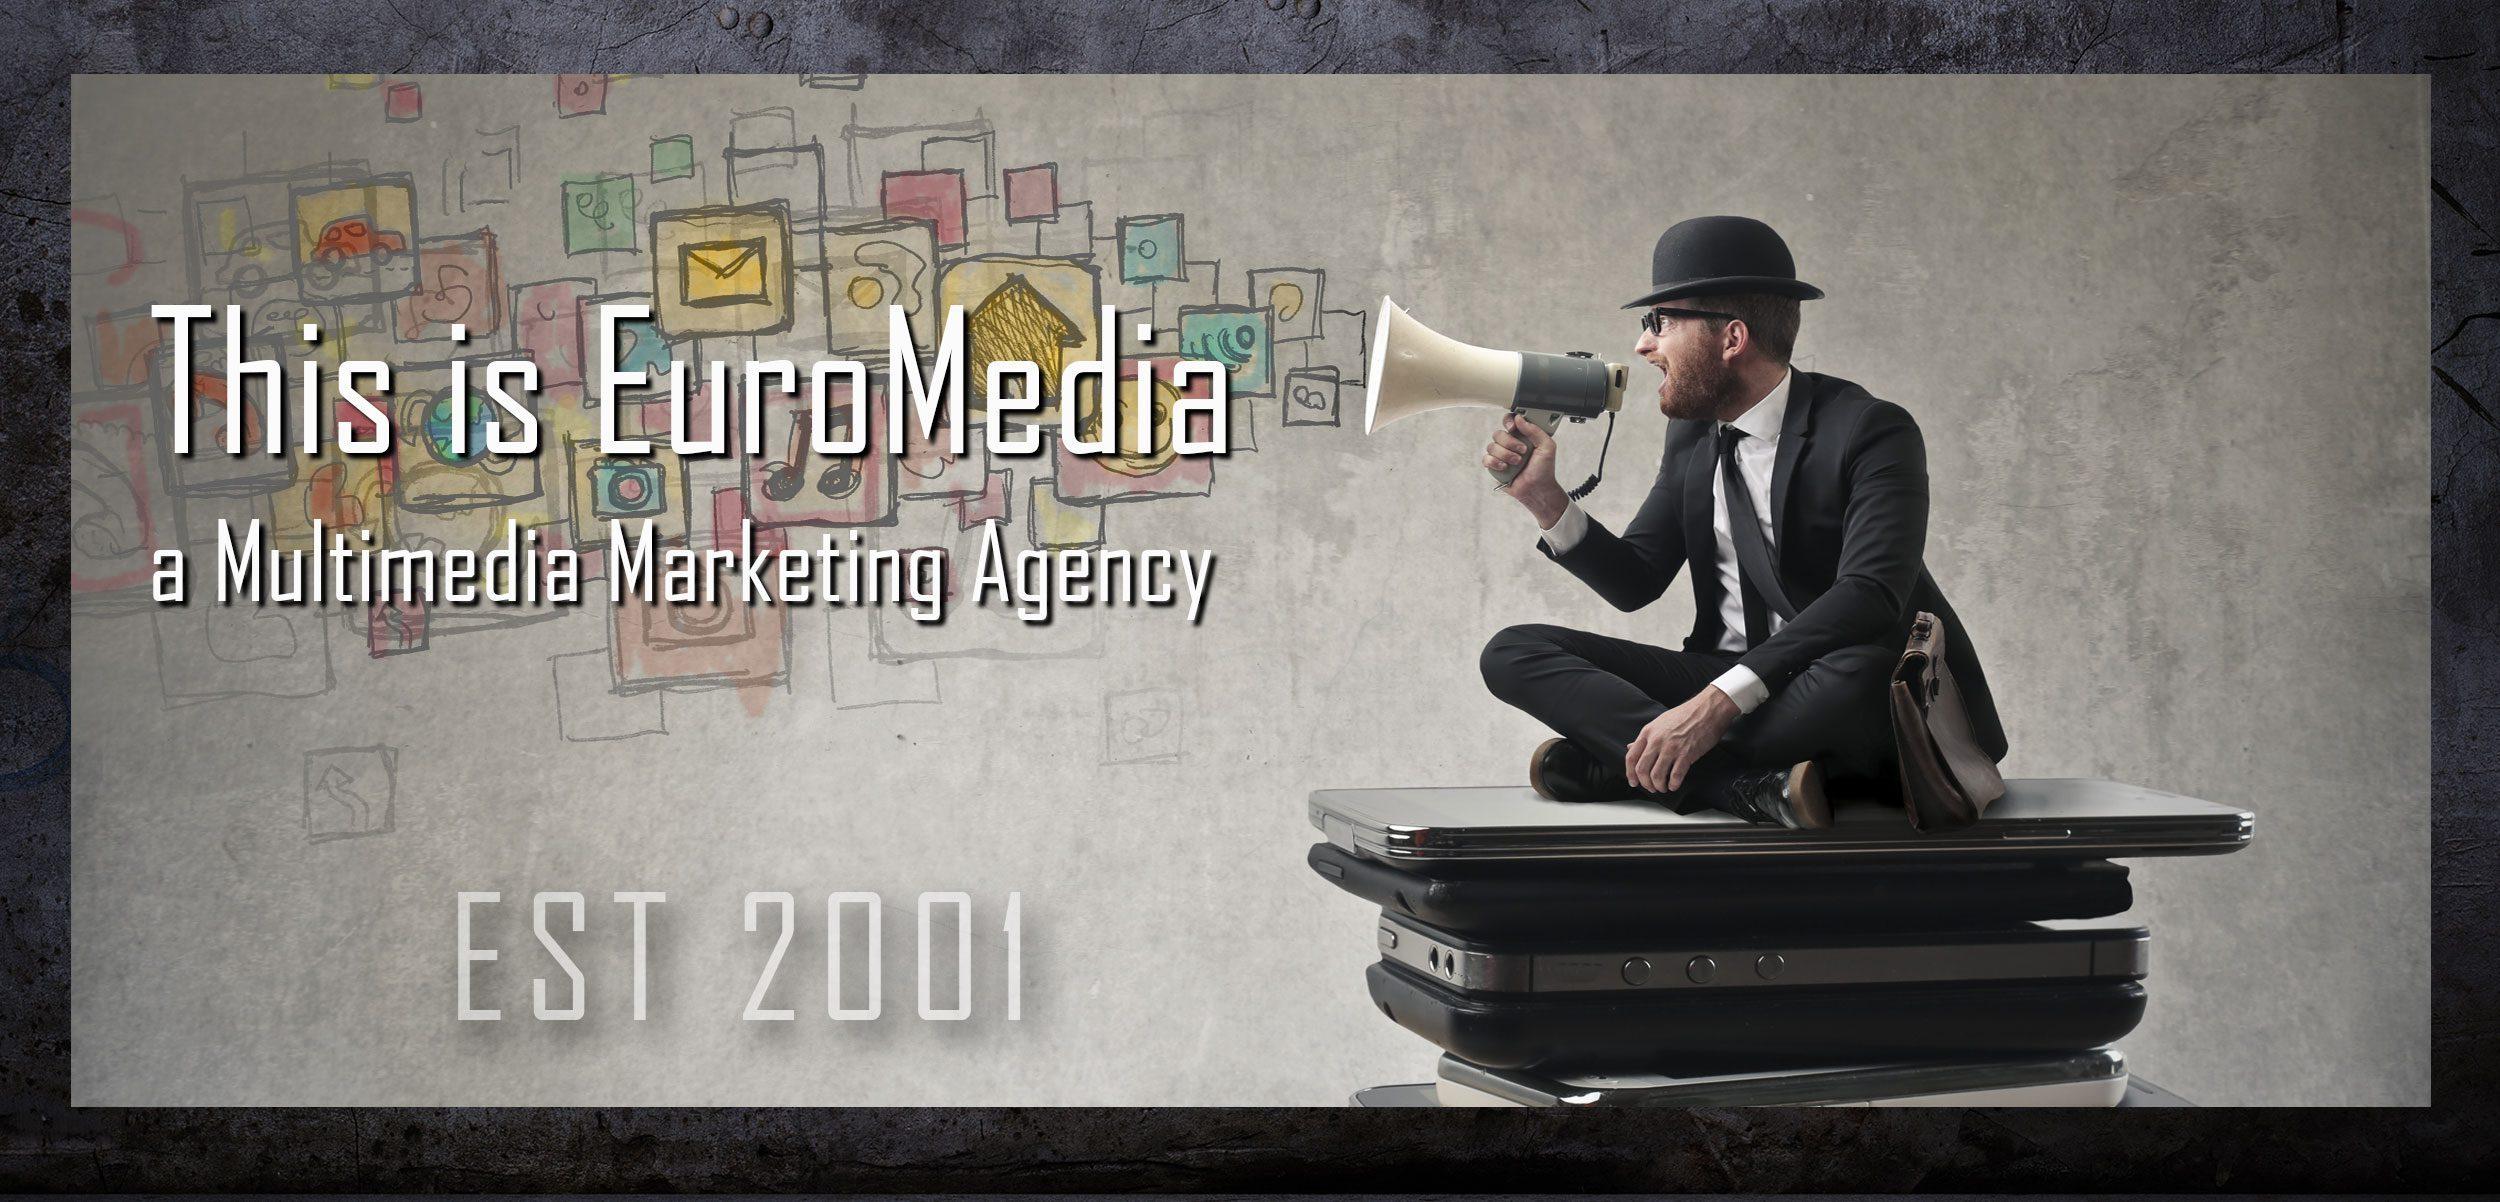 EuroMedia - a Multimedia Marketing Agency